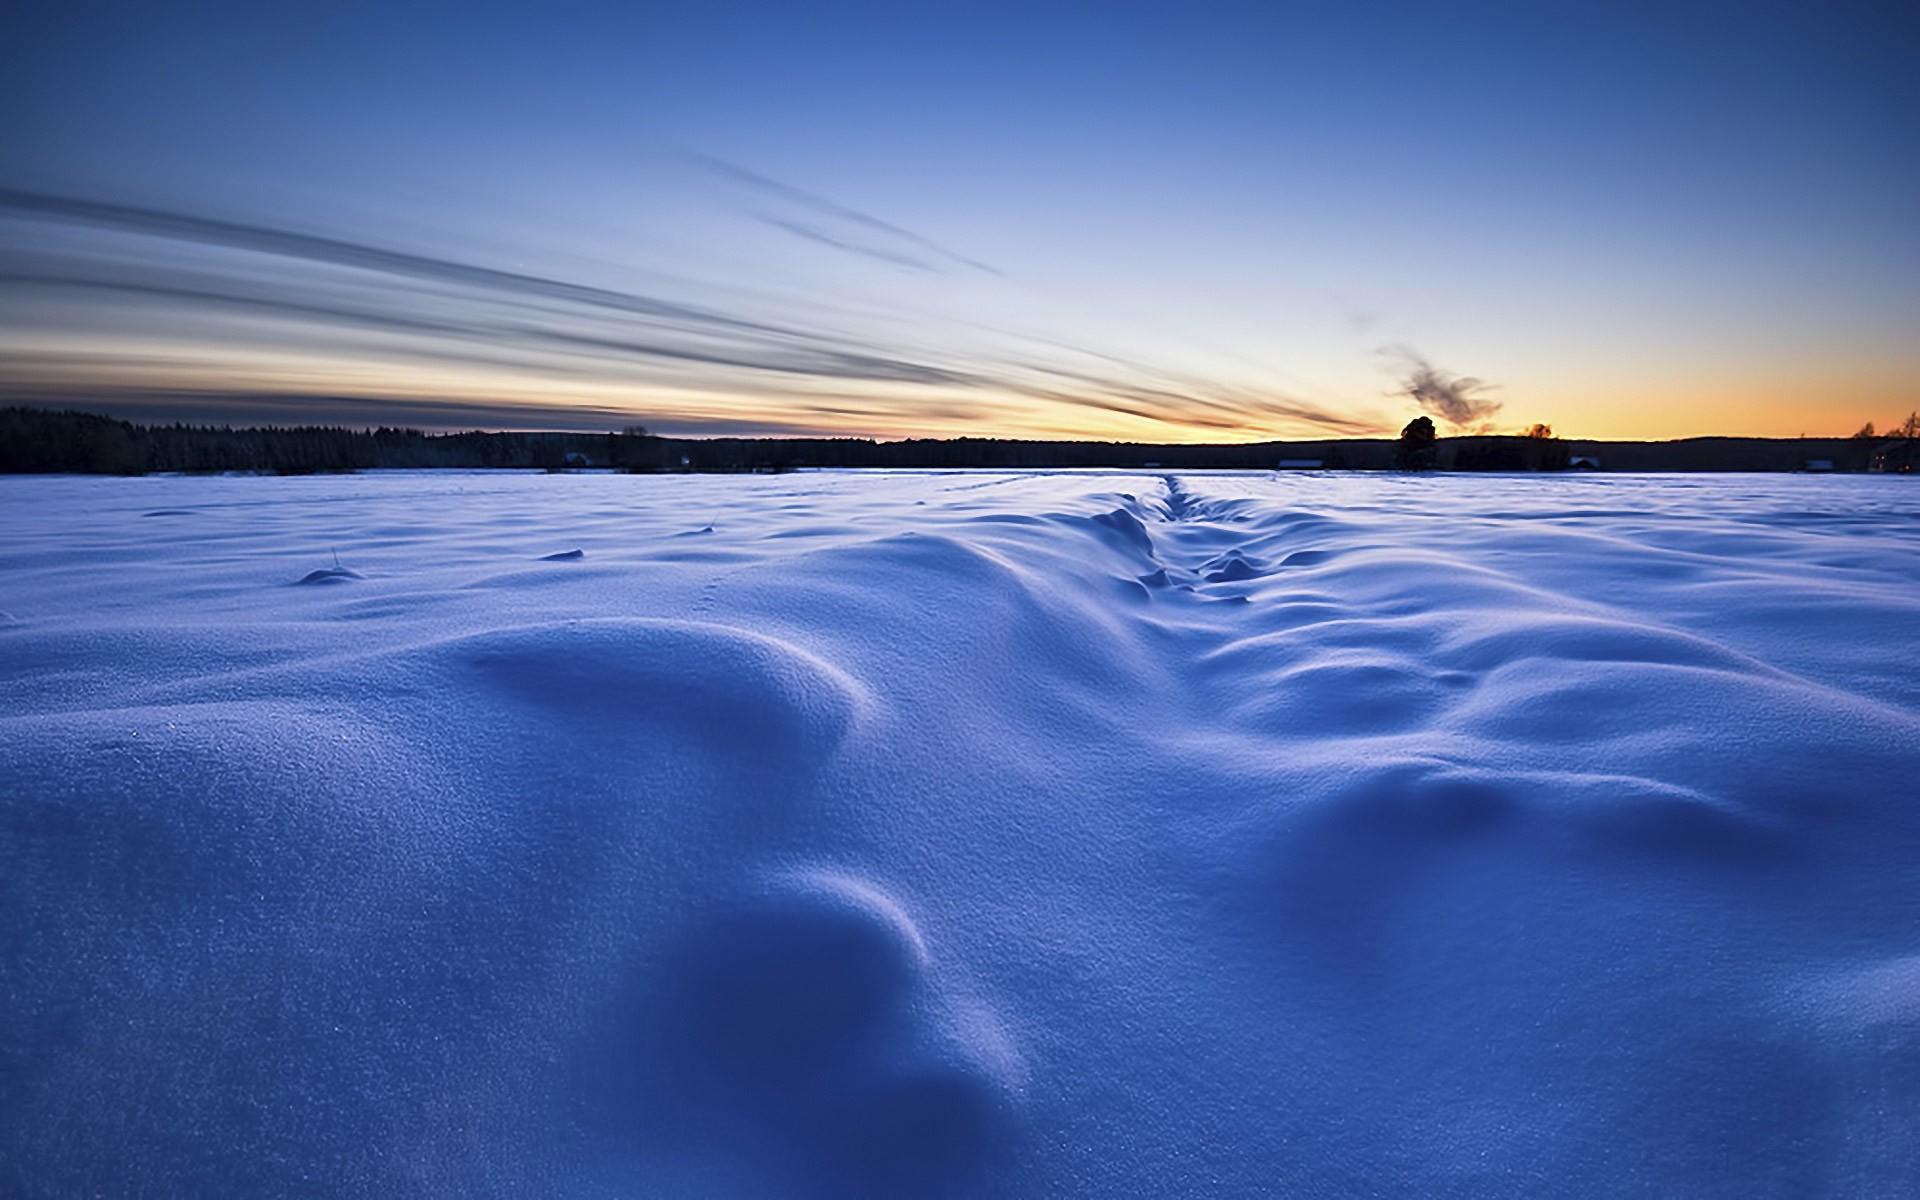 Winter Wonderland Wallpaper ·① Download Free Stunning